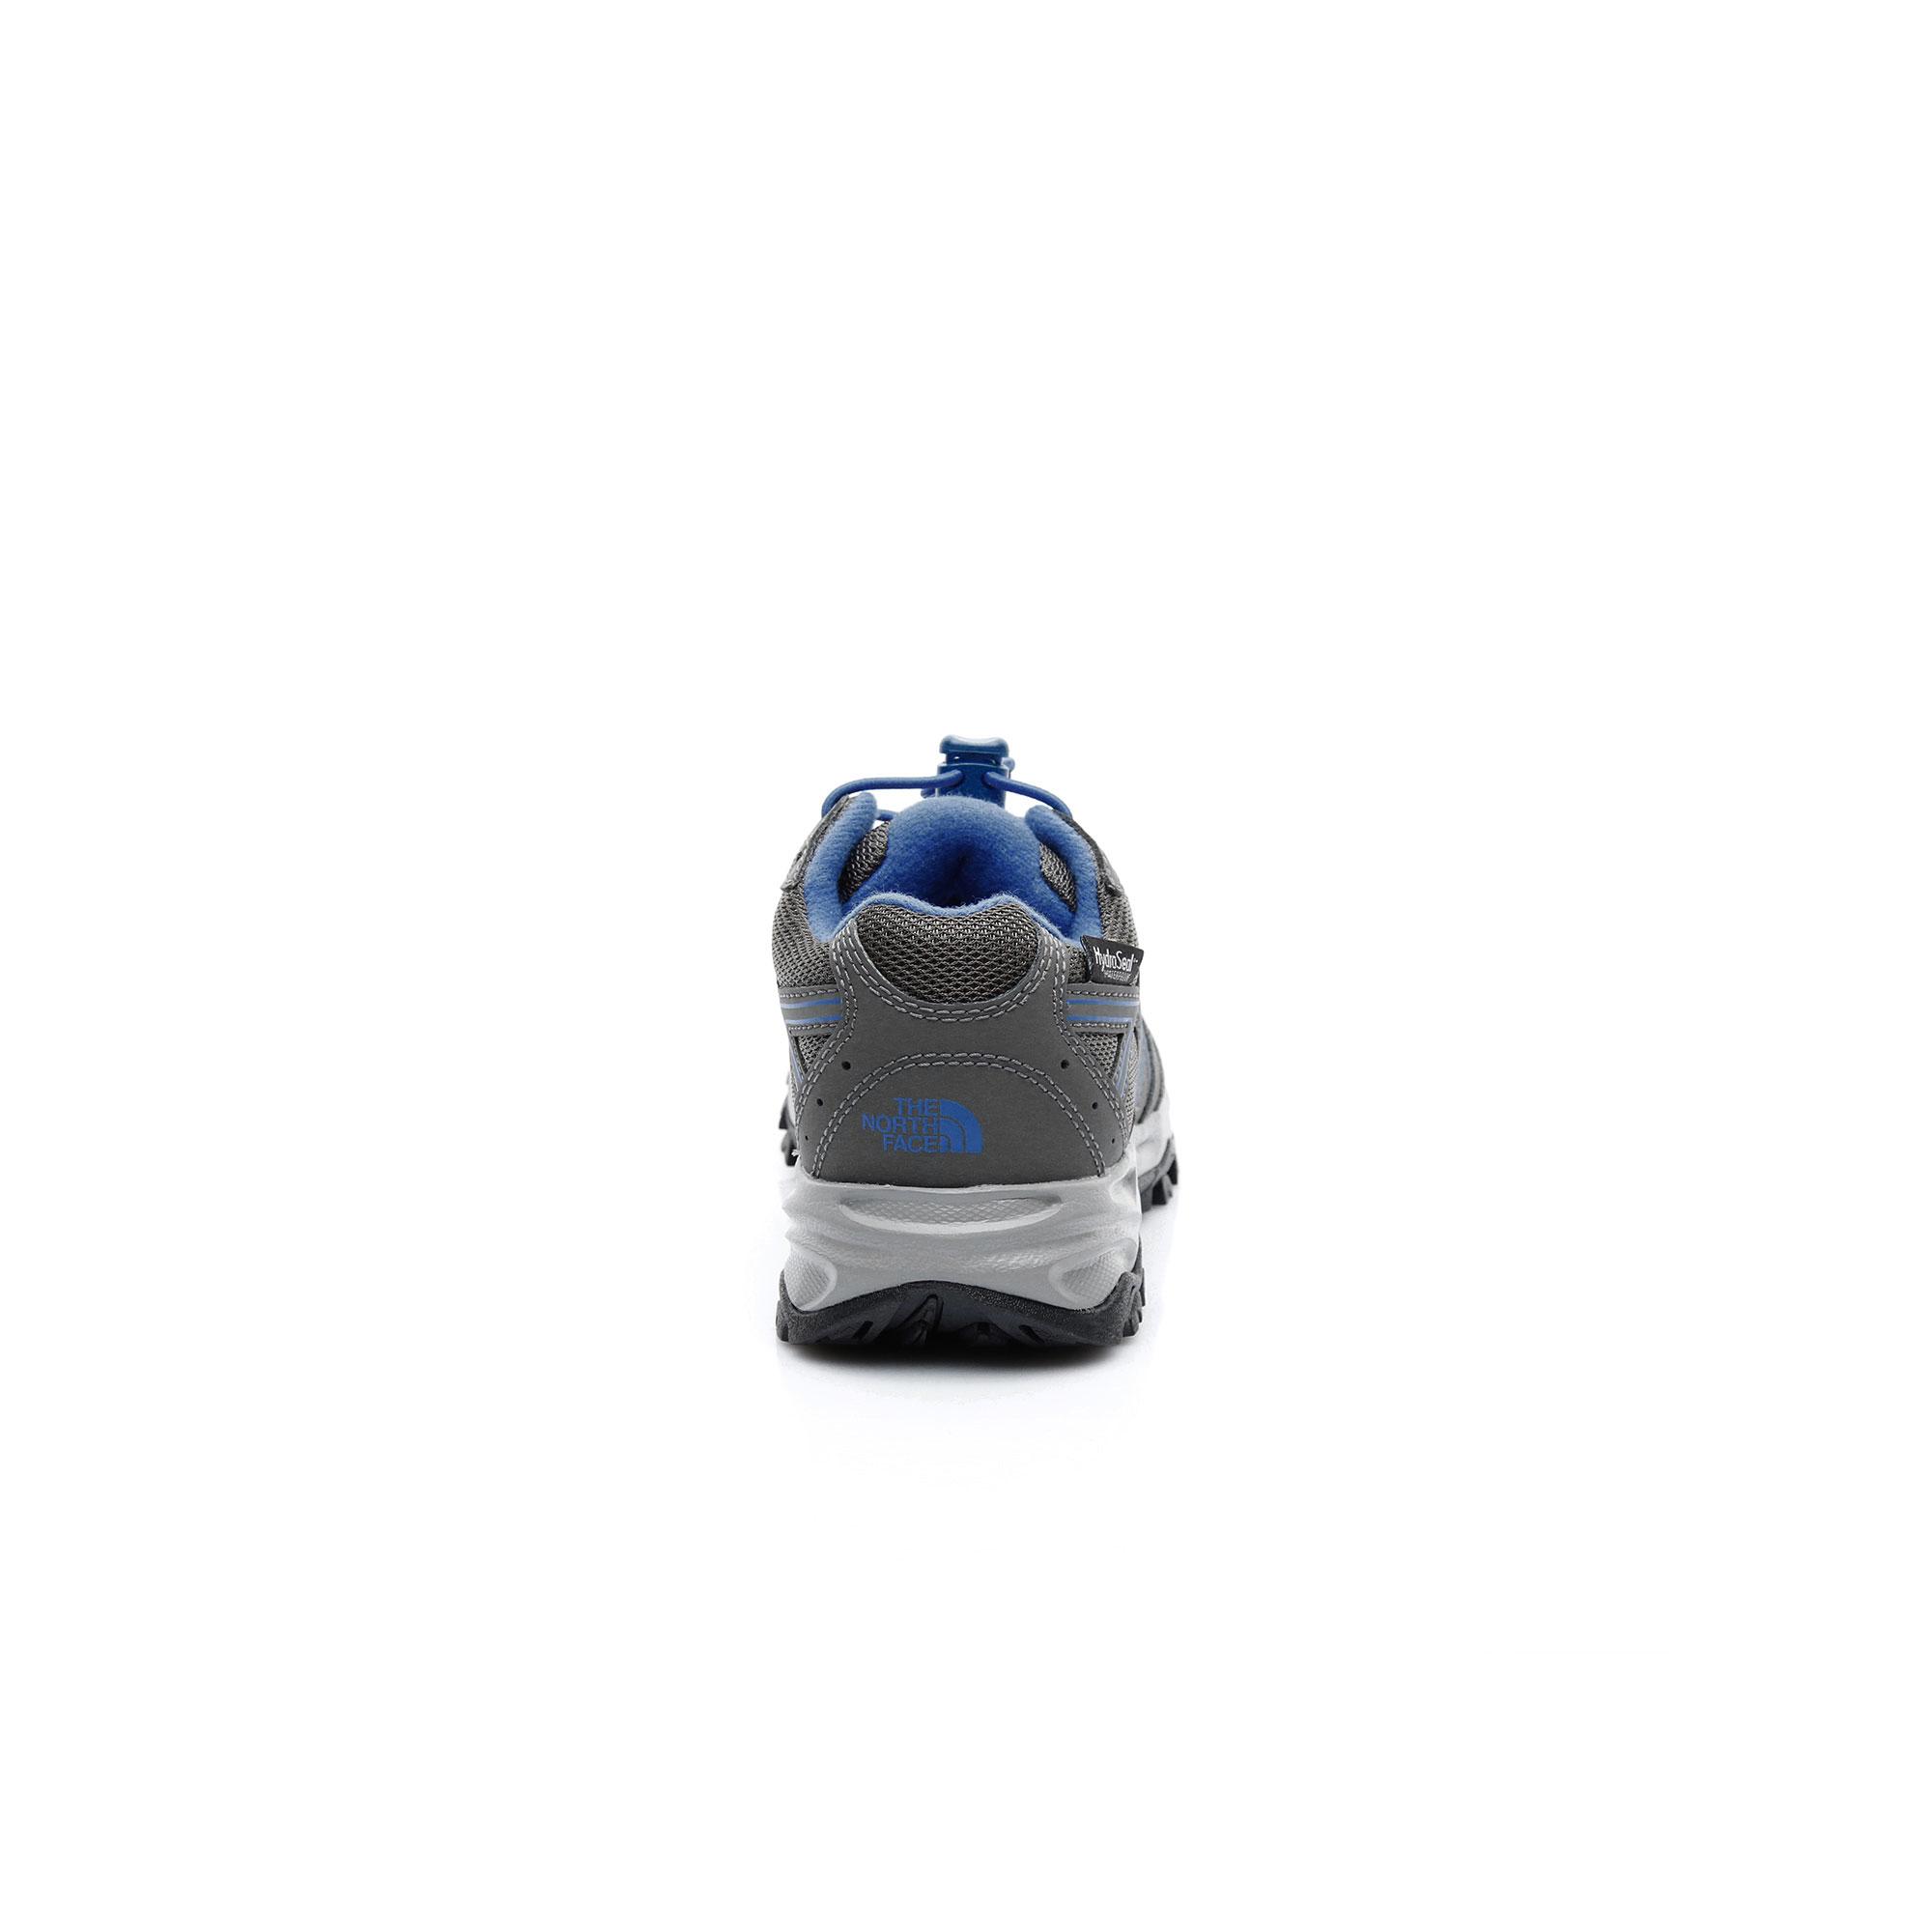 The North Face Jr Hedgehog Hıker Wp Çocuk Gri Bot